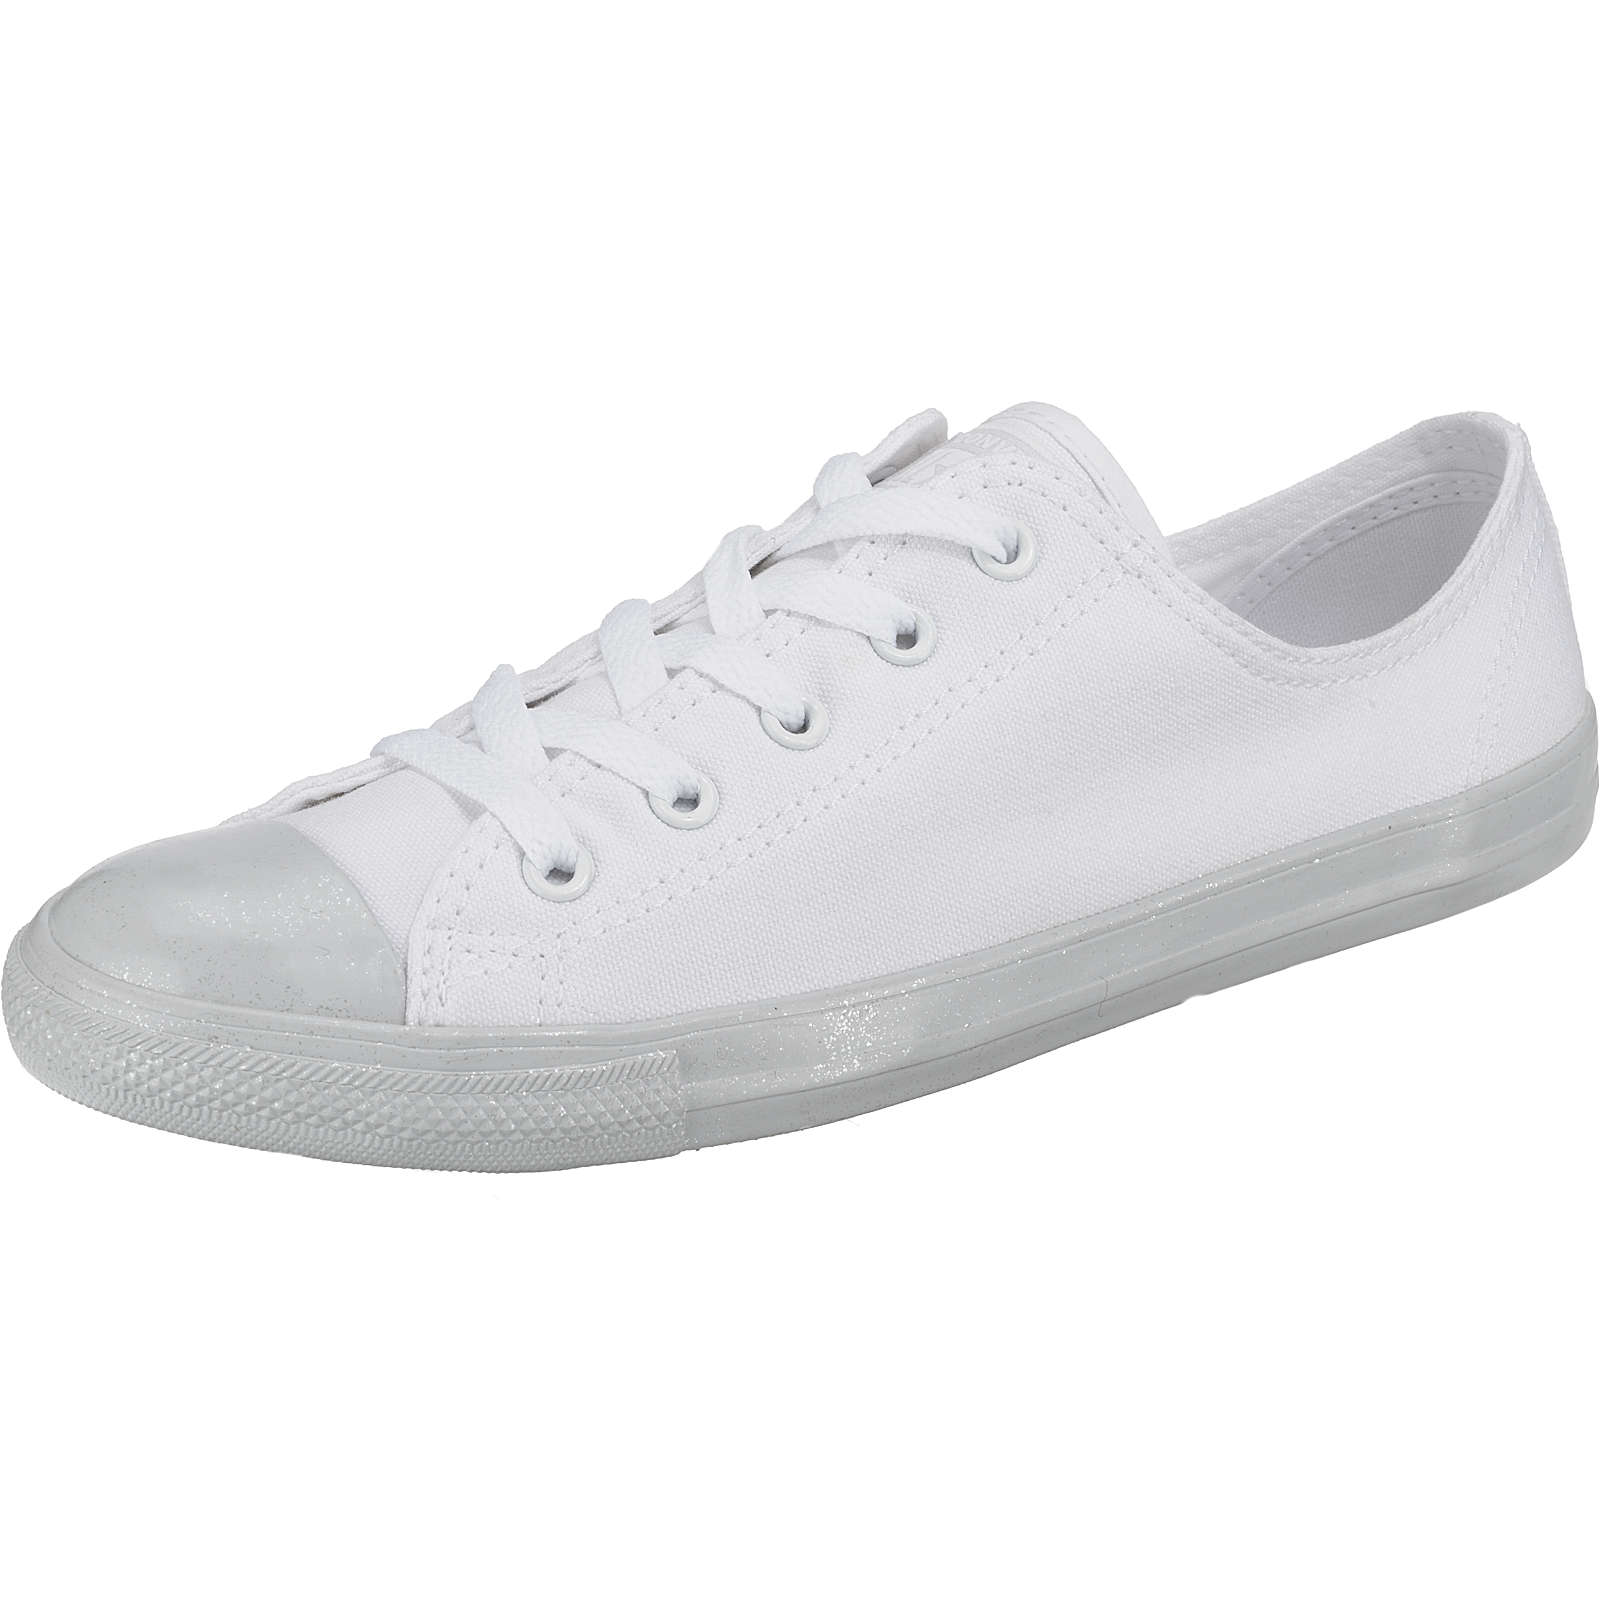 CONVERSE Chuck Taylor All Star Dainty Ox Sneakers Low weiß Damen Gr. 36